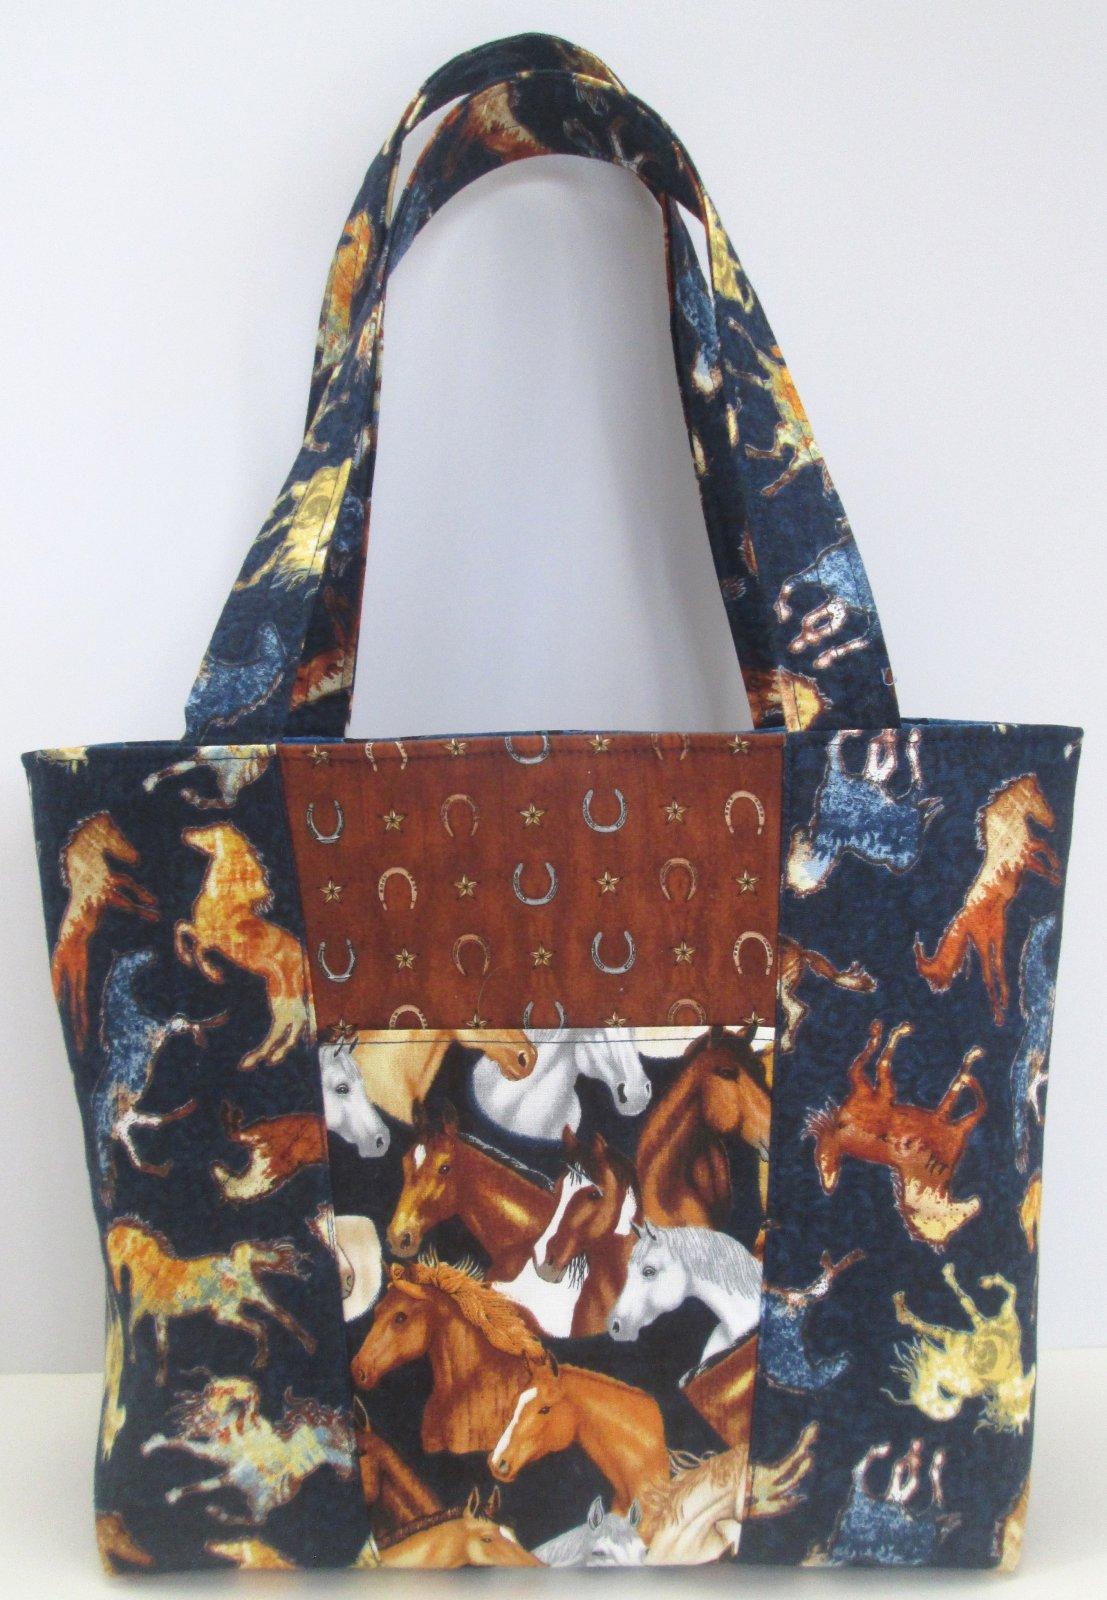 Mustang Sunset Claire Handbag Sample 10.25 x 9.25 x 4